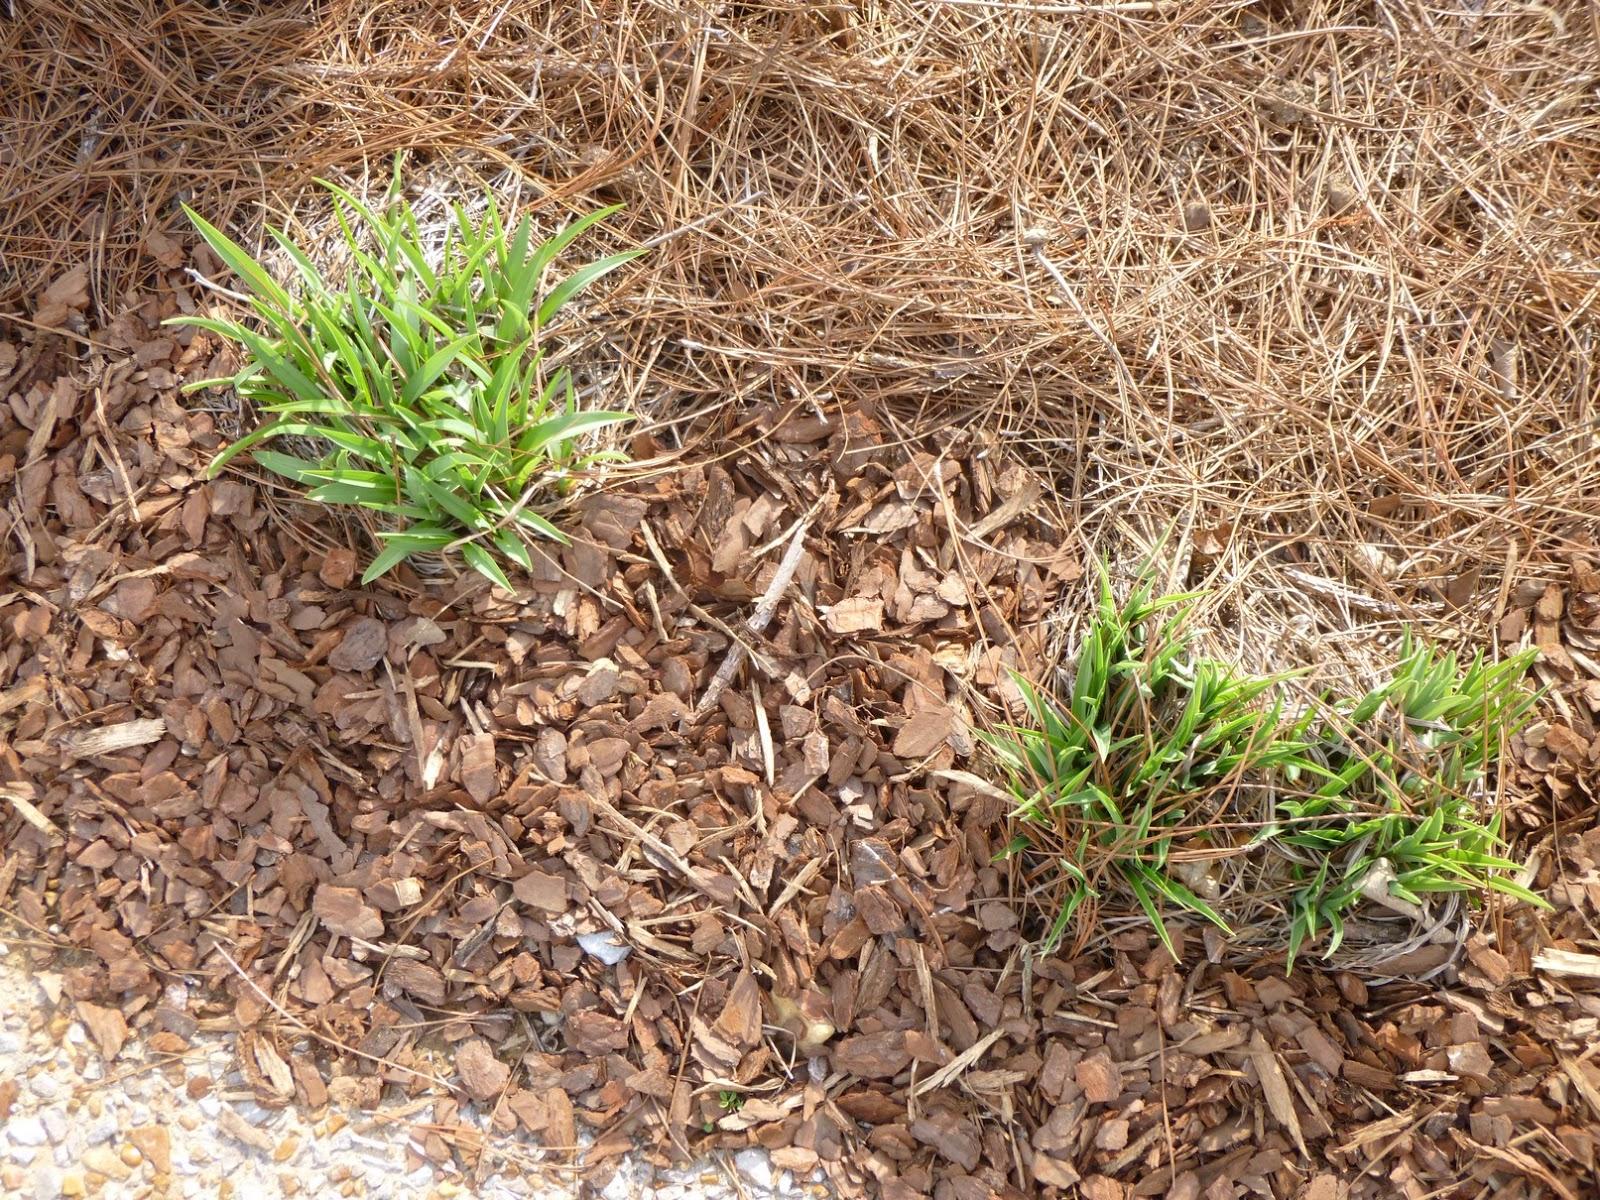 Garden of Aaron: Eating My Words on Pine Straw